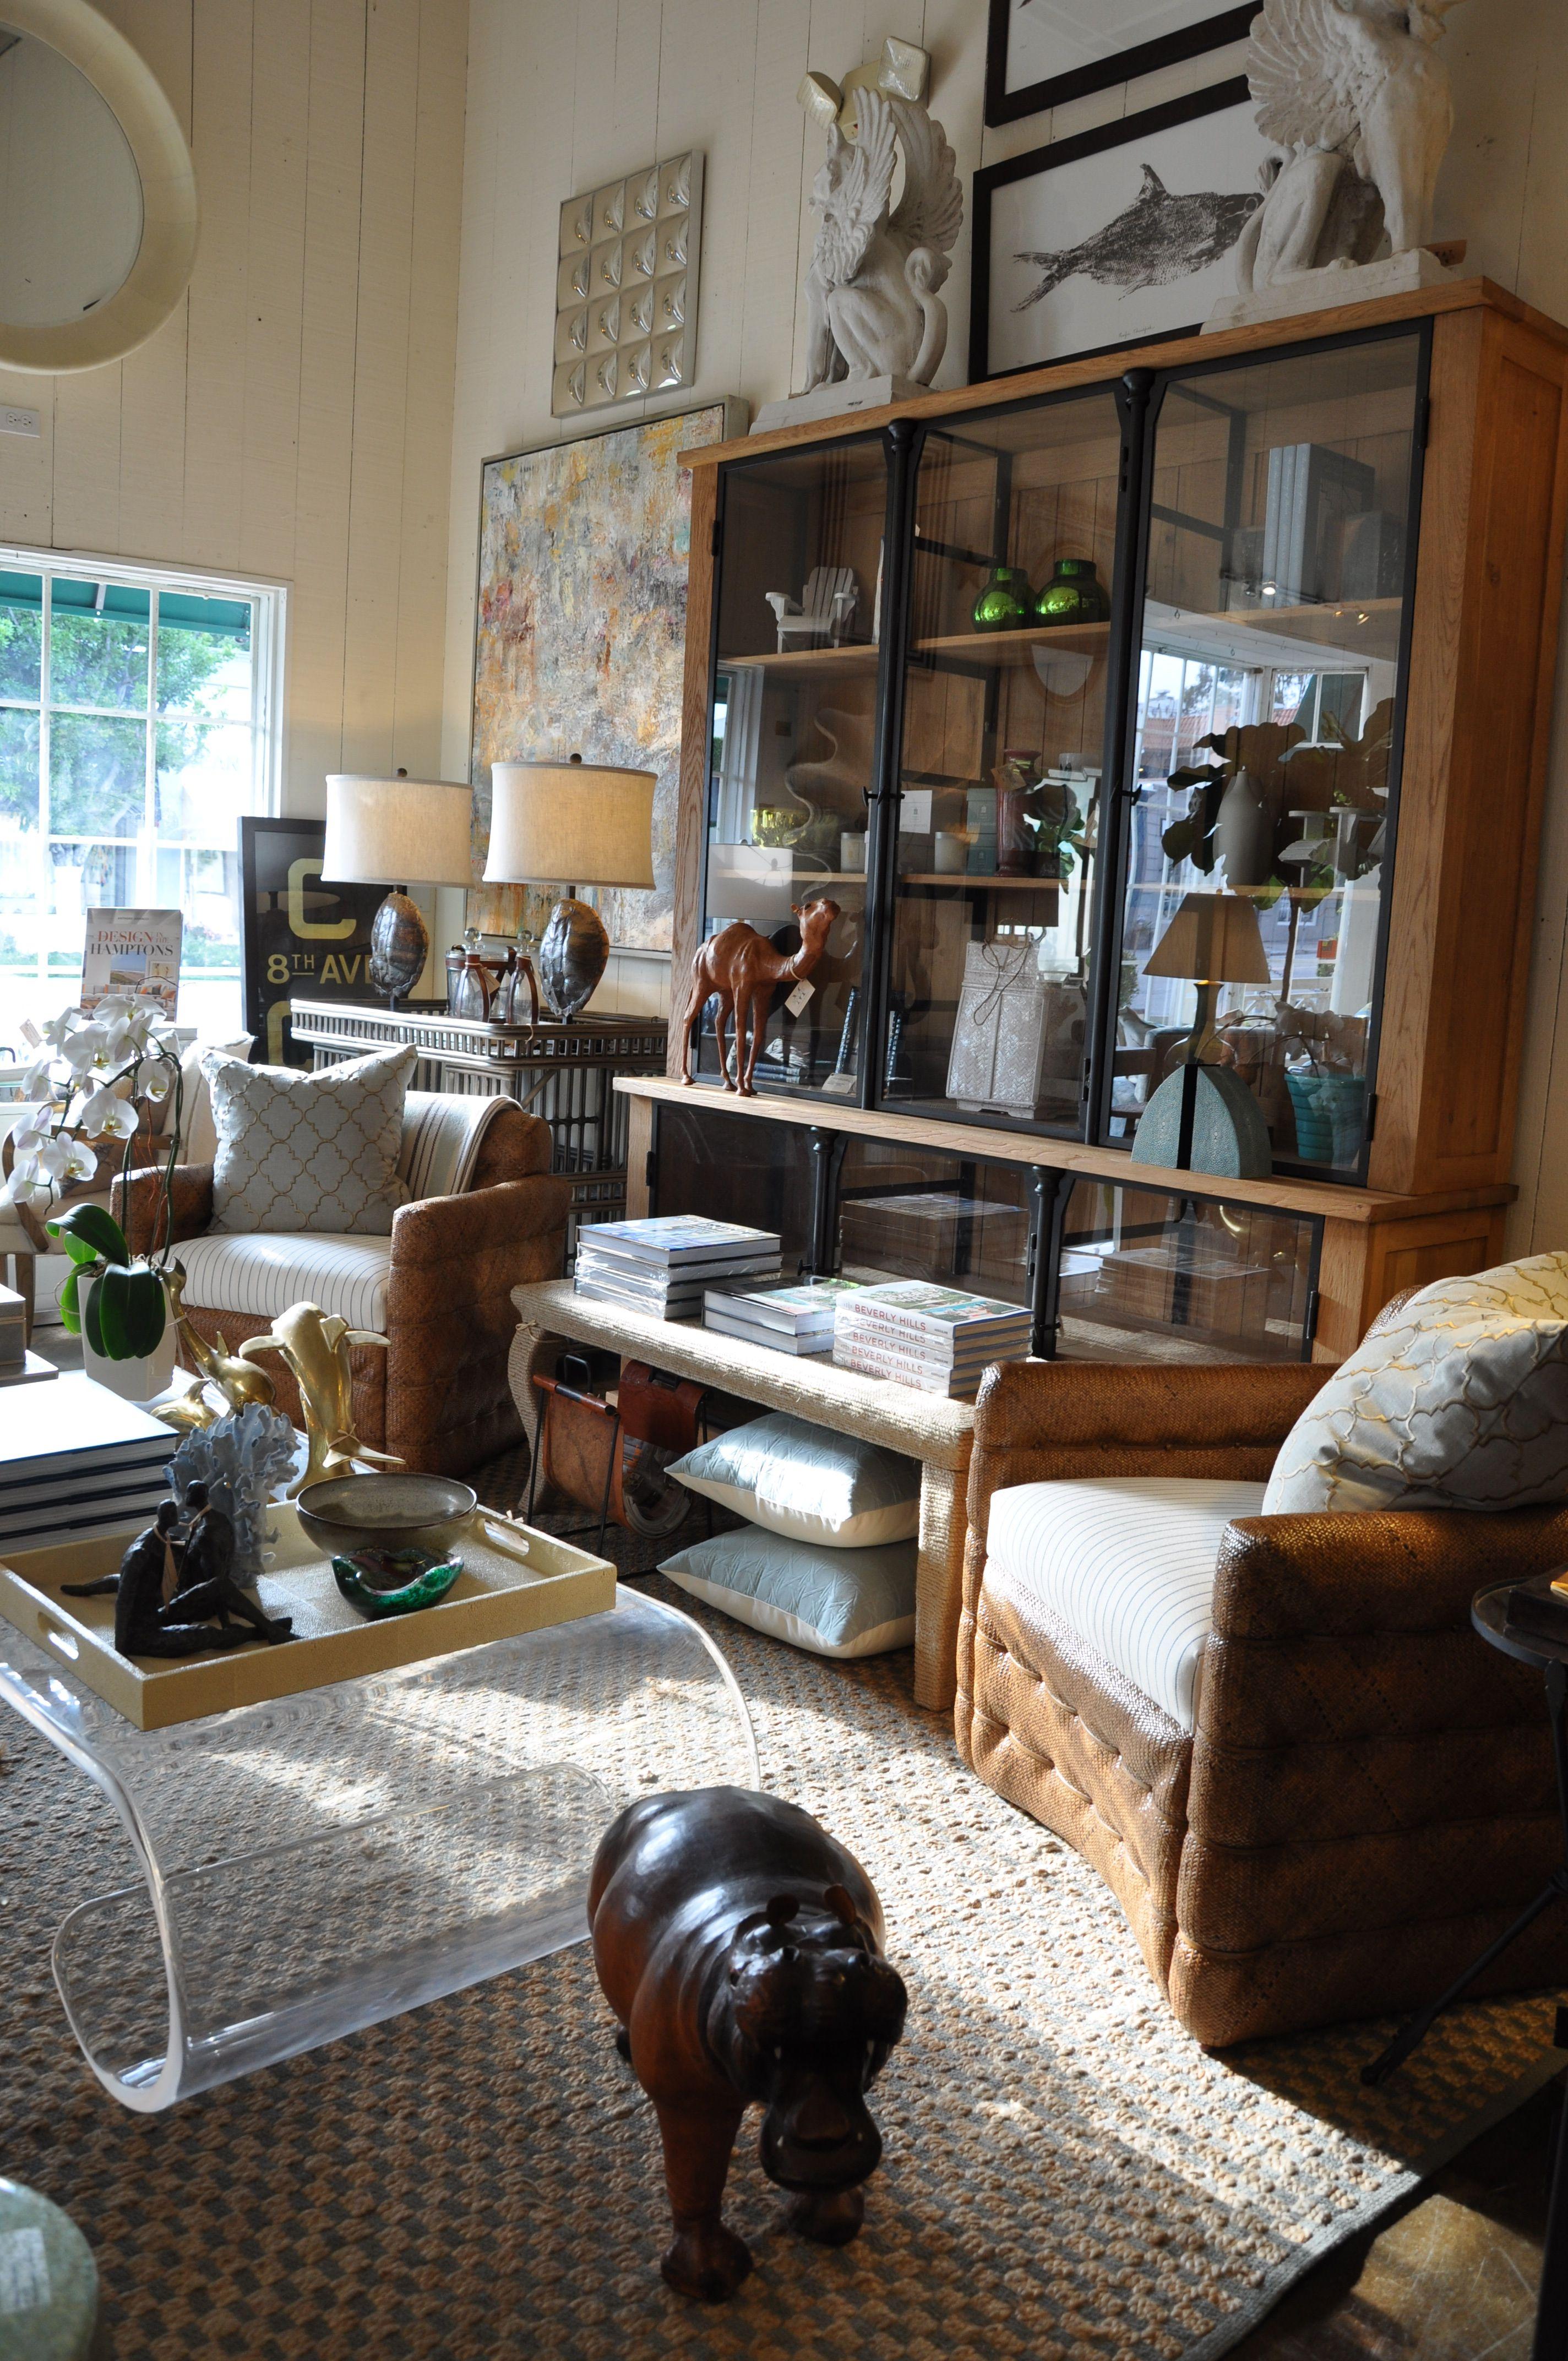 LA #Mecox #interiordesign #MecoxGardens #furniture #shopping #home